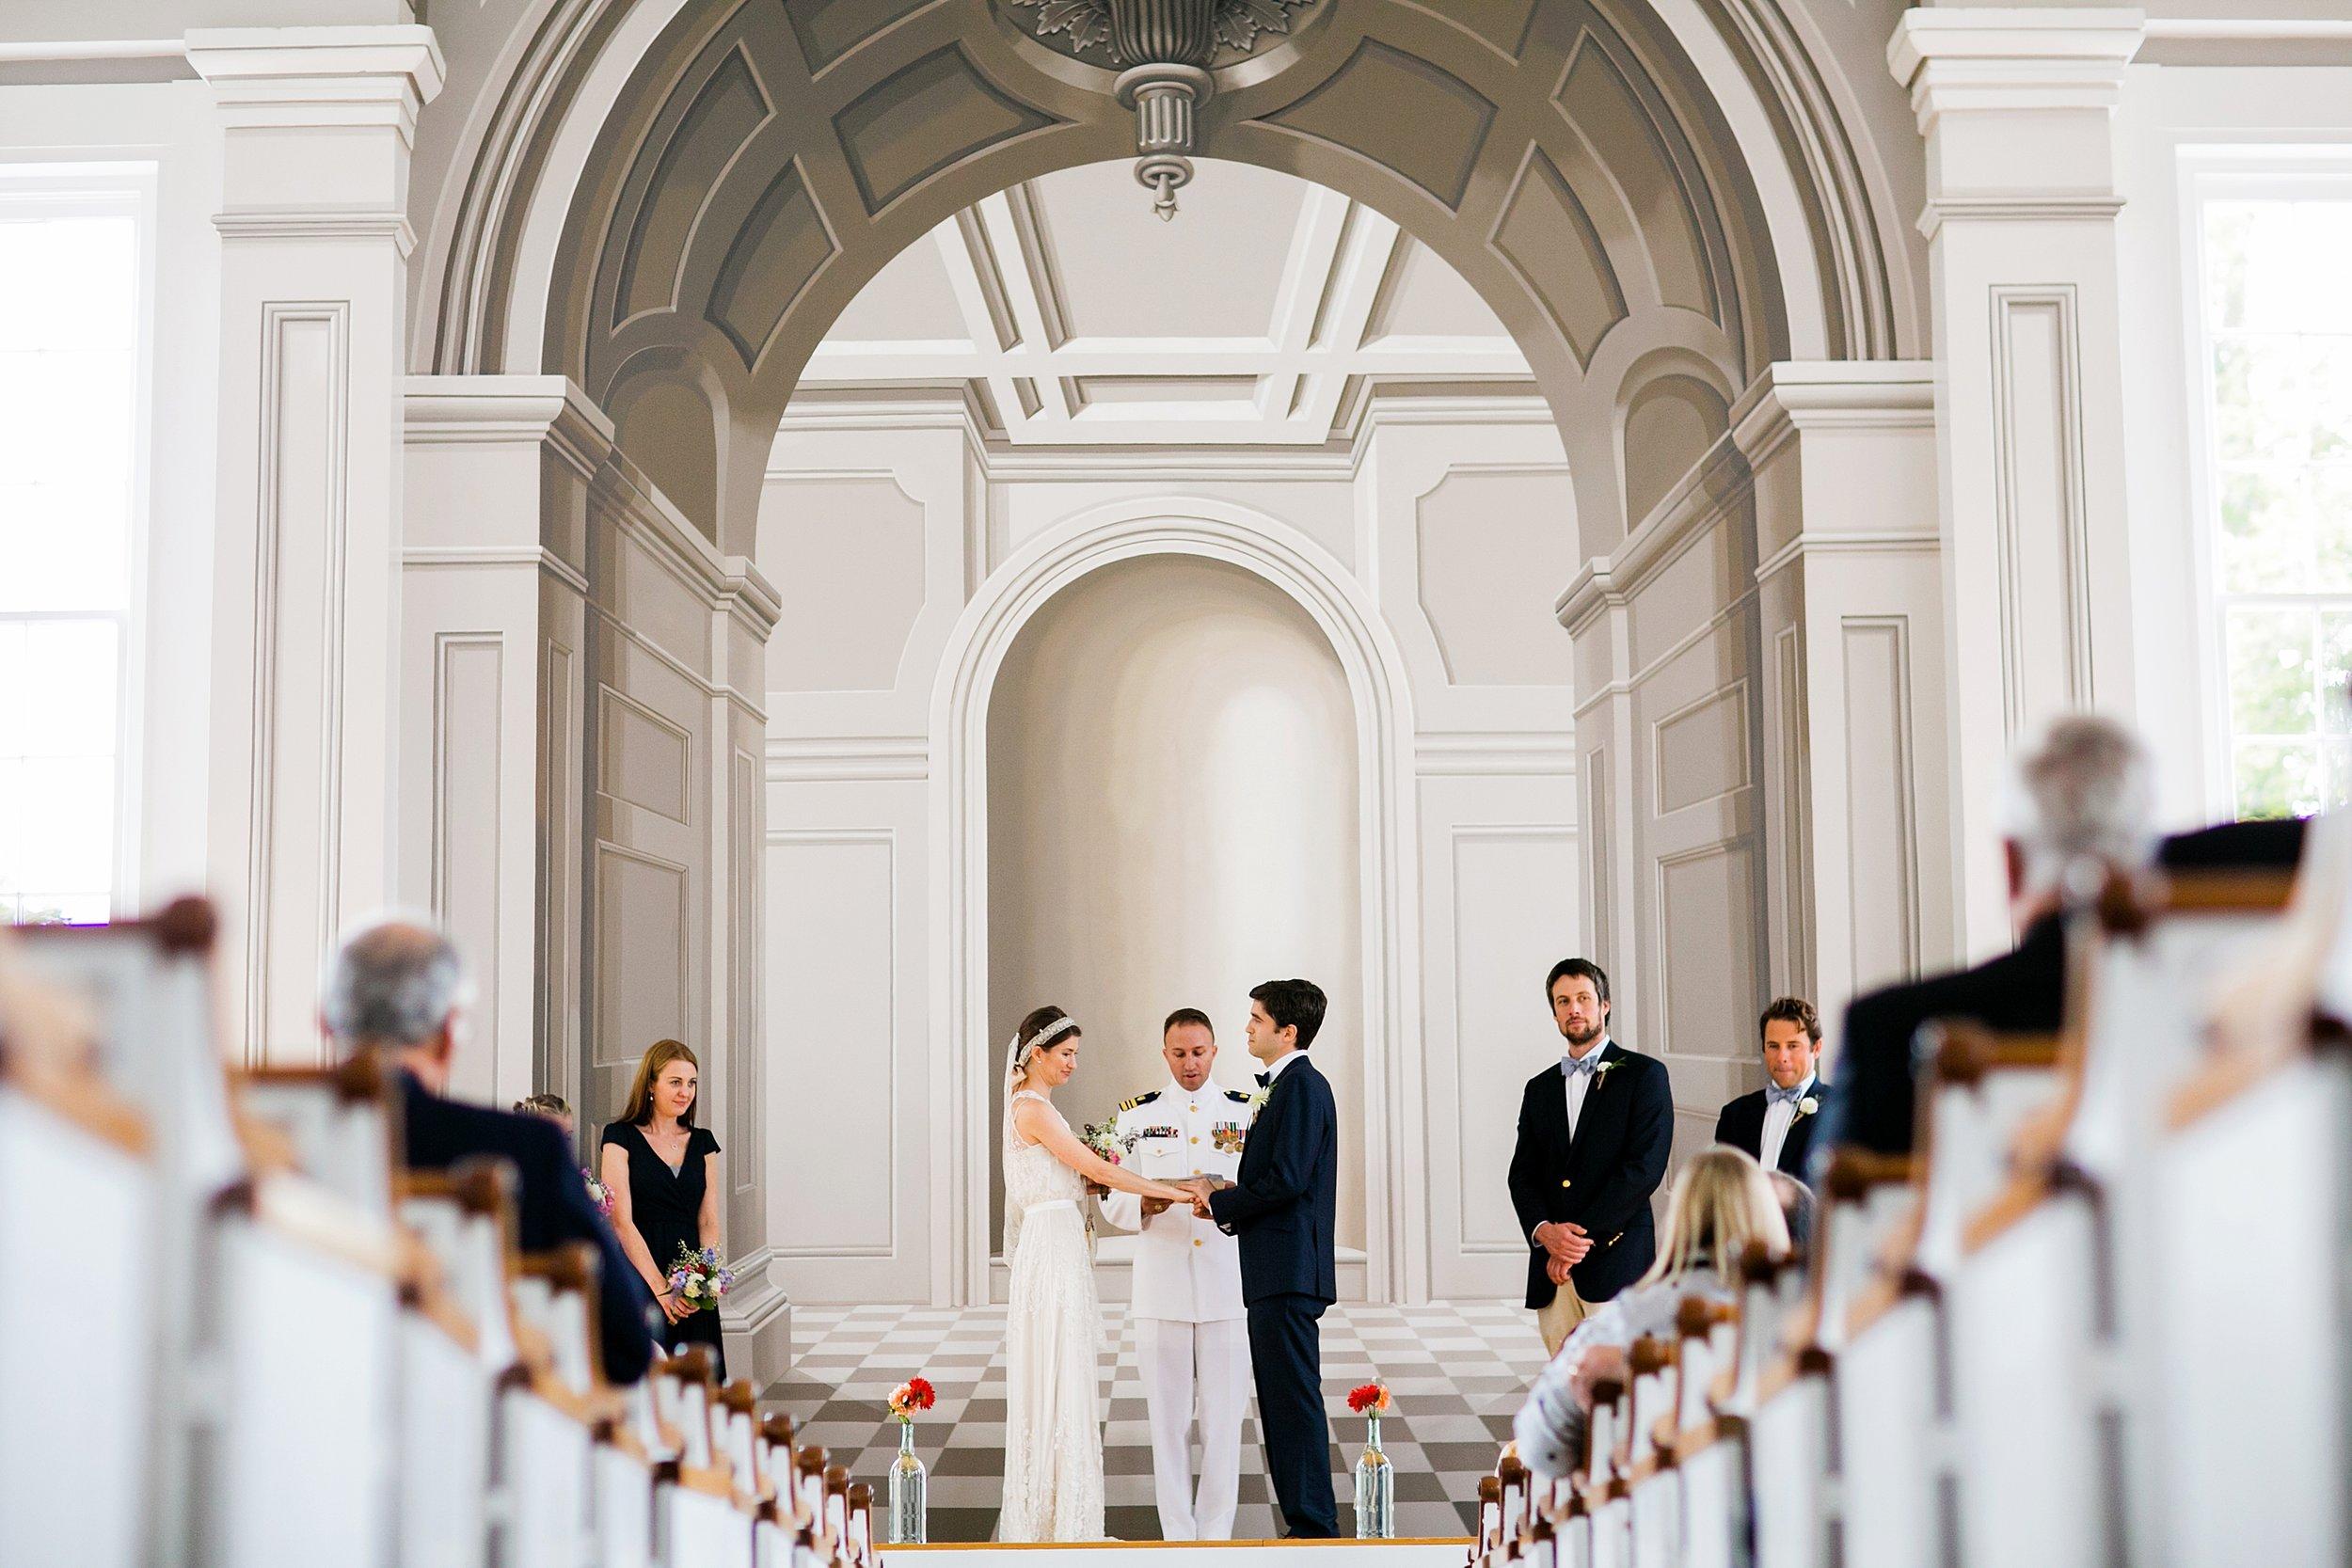 028 marthas vineyard wedding photographer todd danforth photography.jpg